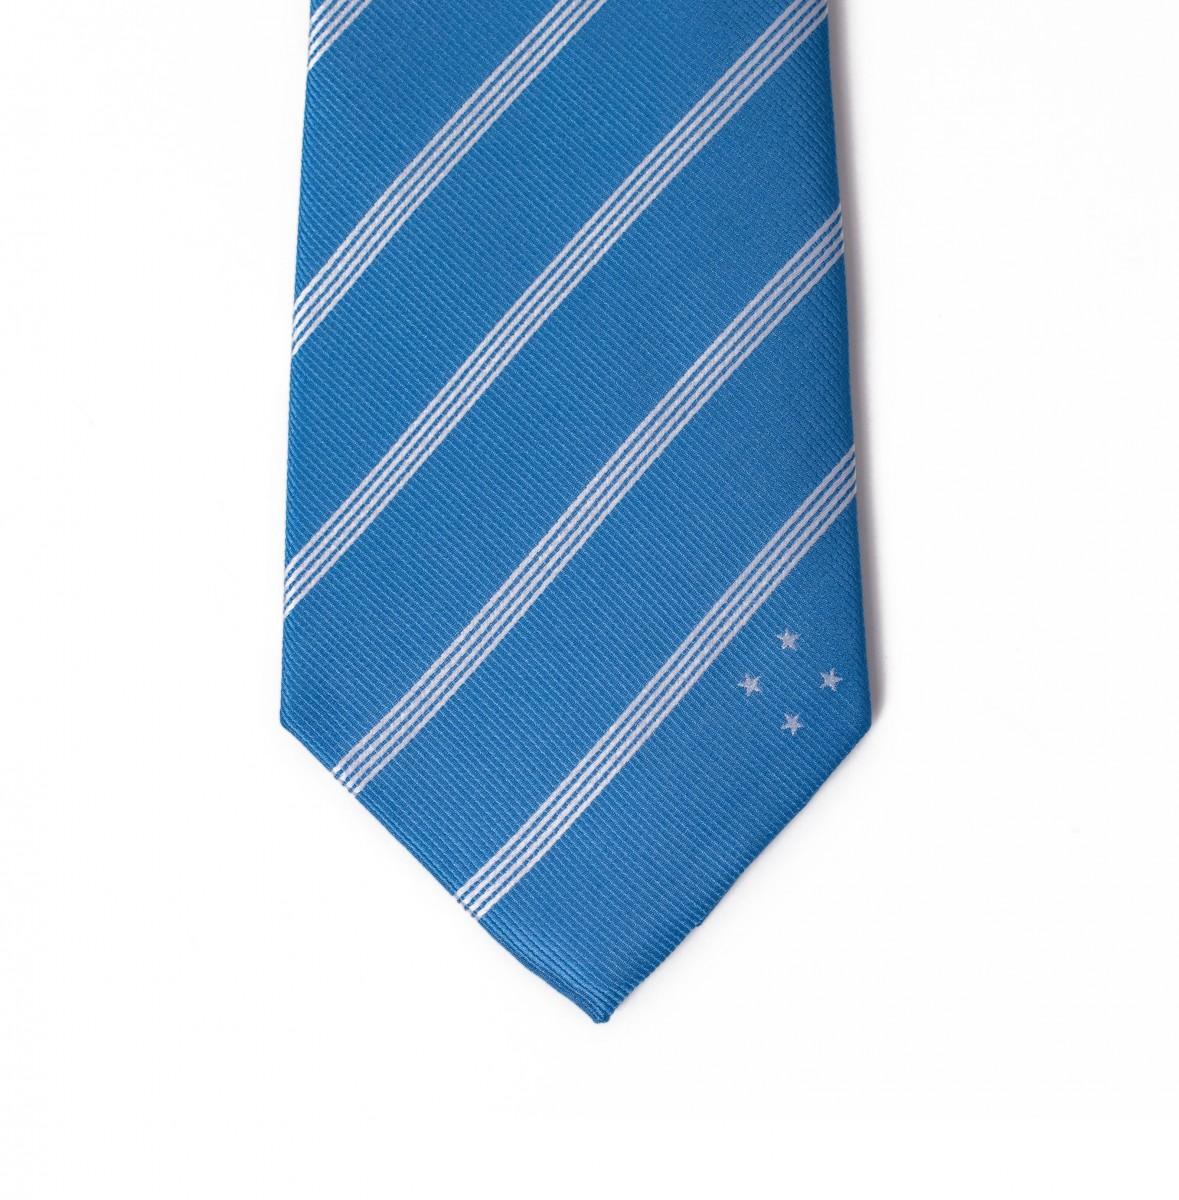 Micronesia Tie